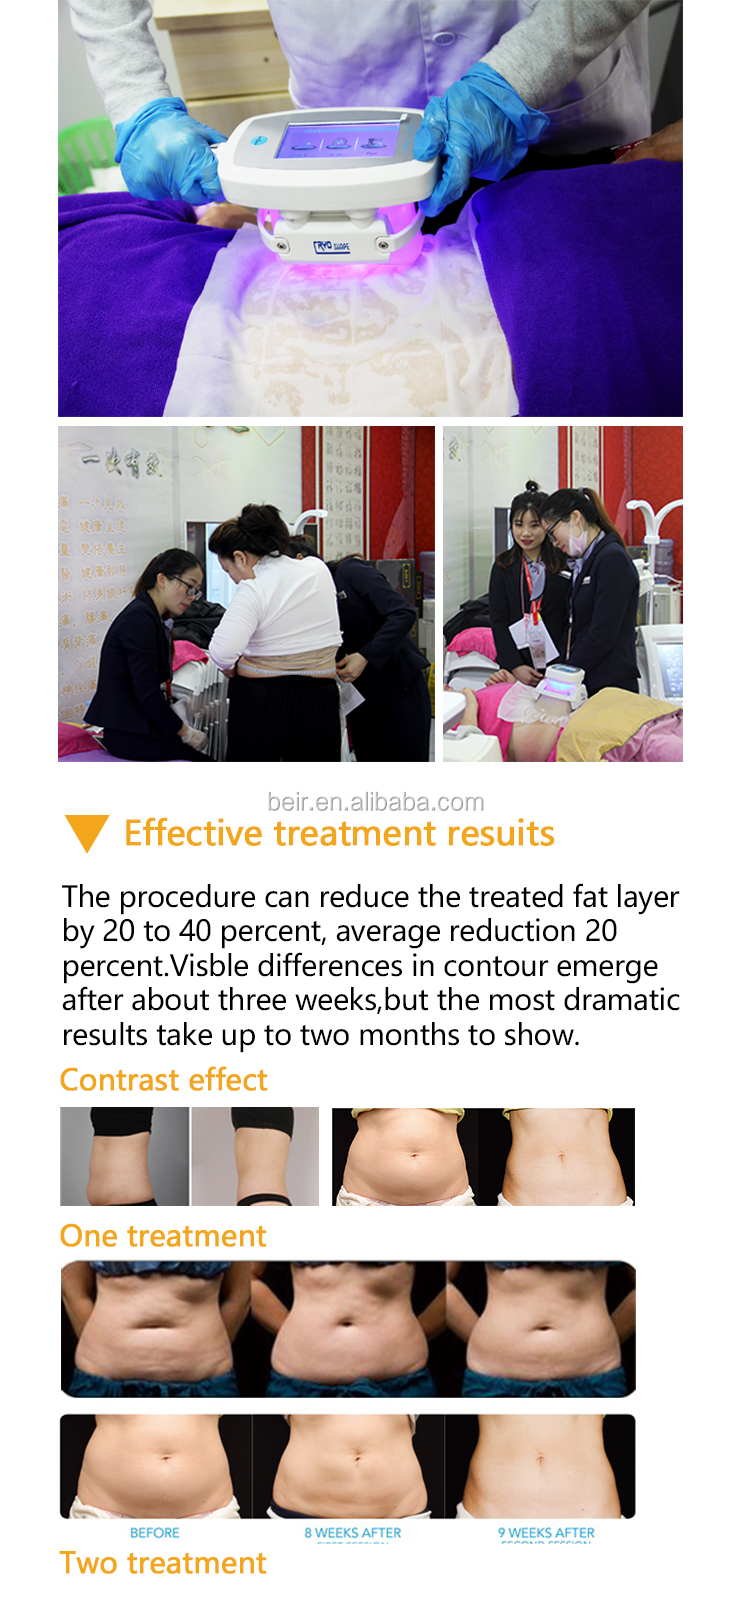 Weight loss diet plan sri lanka image 3